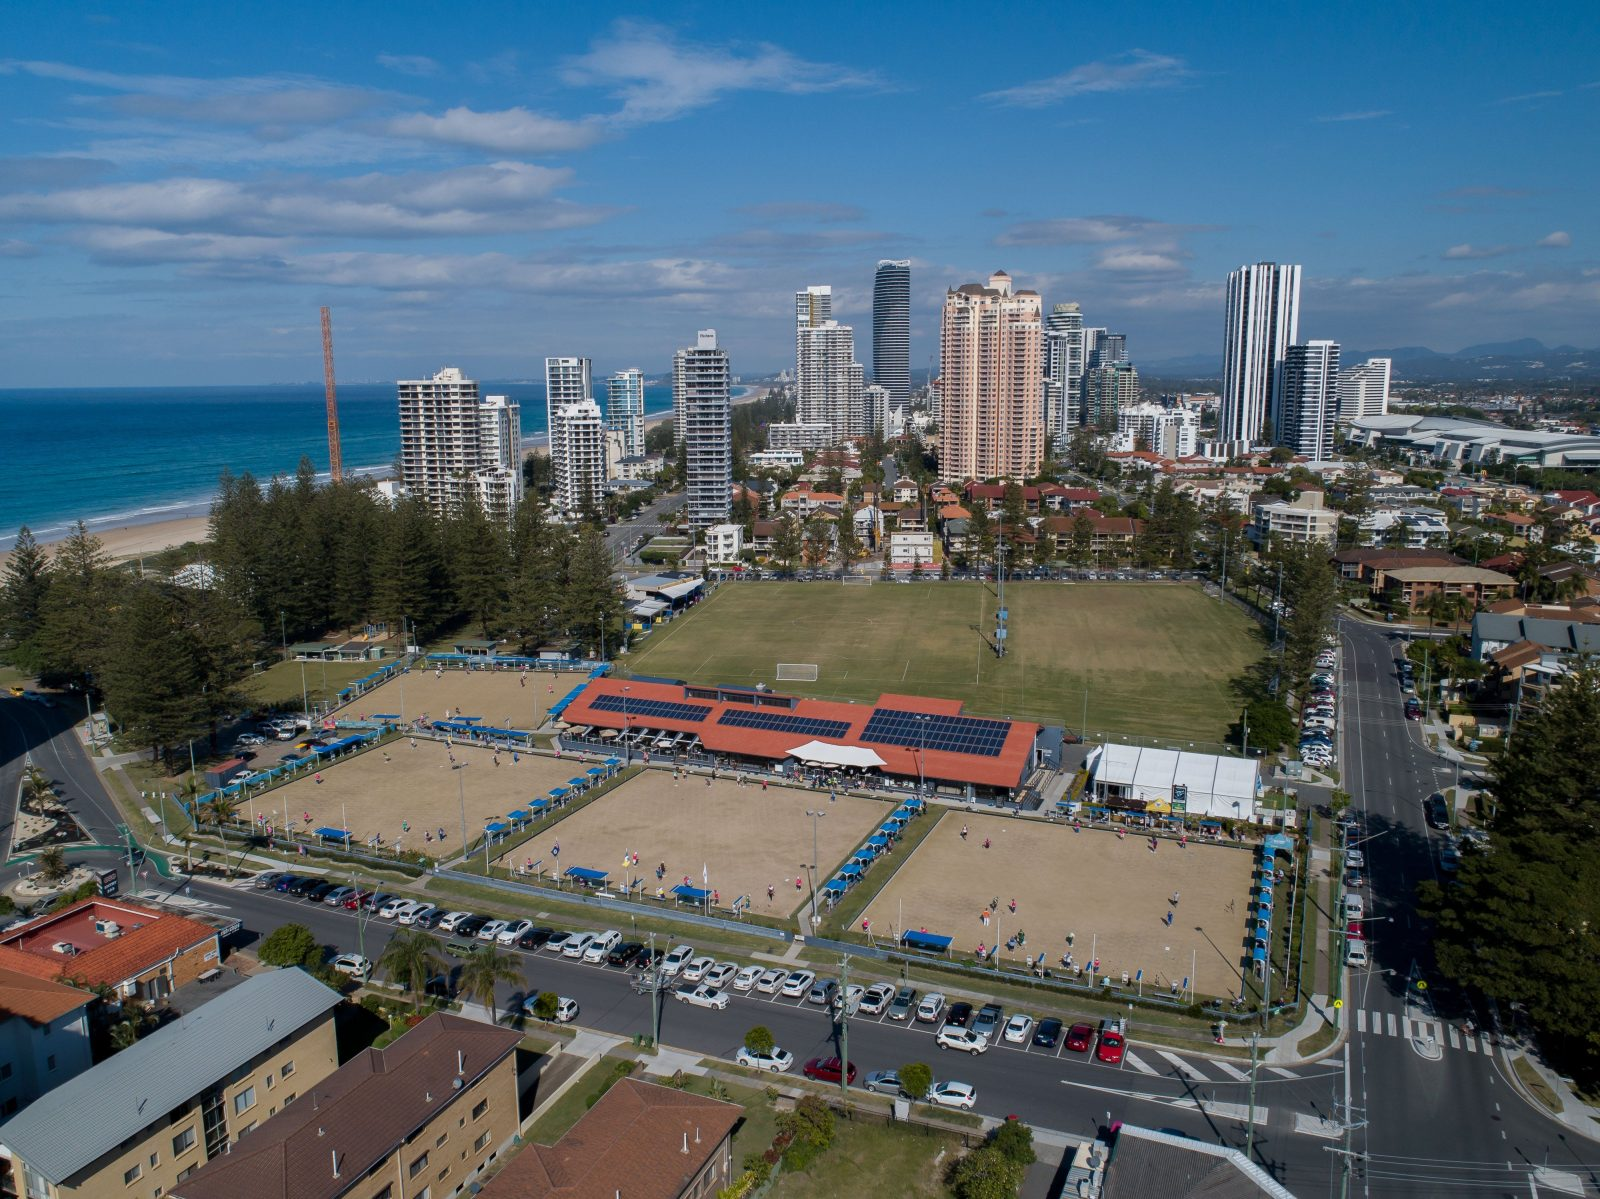 Gold Coast's idyllic Broadbeach Bowls Club